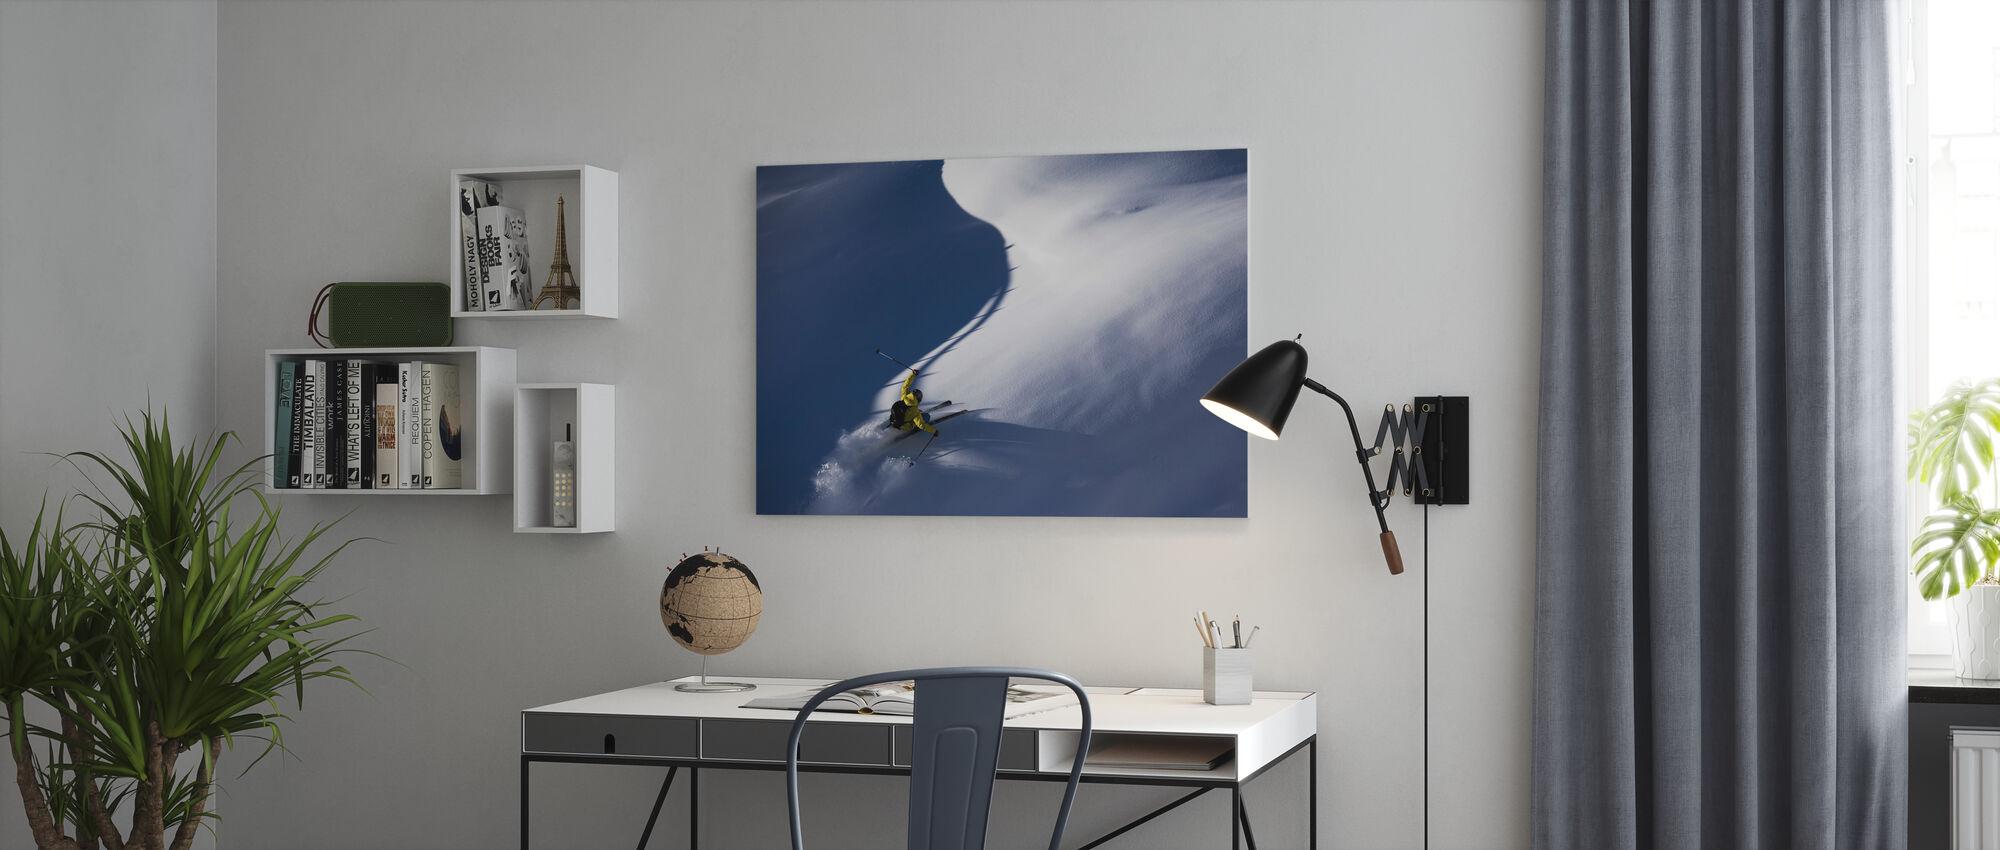 Esquí de nieve en polvo - Lienzo - Oficina